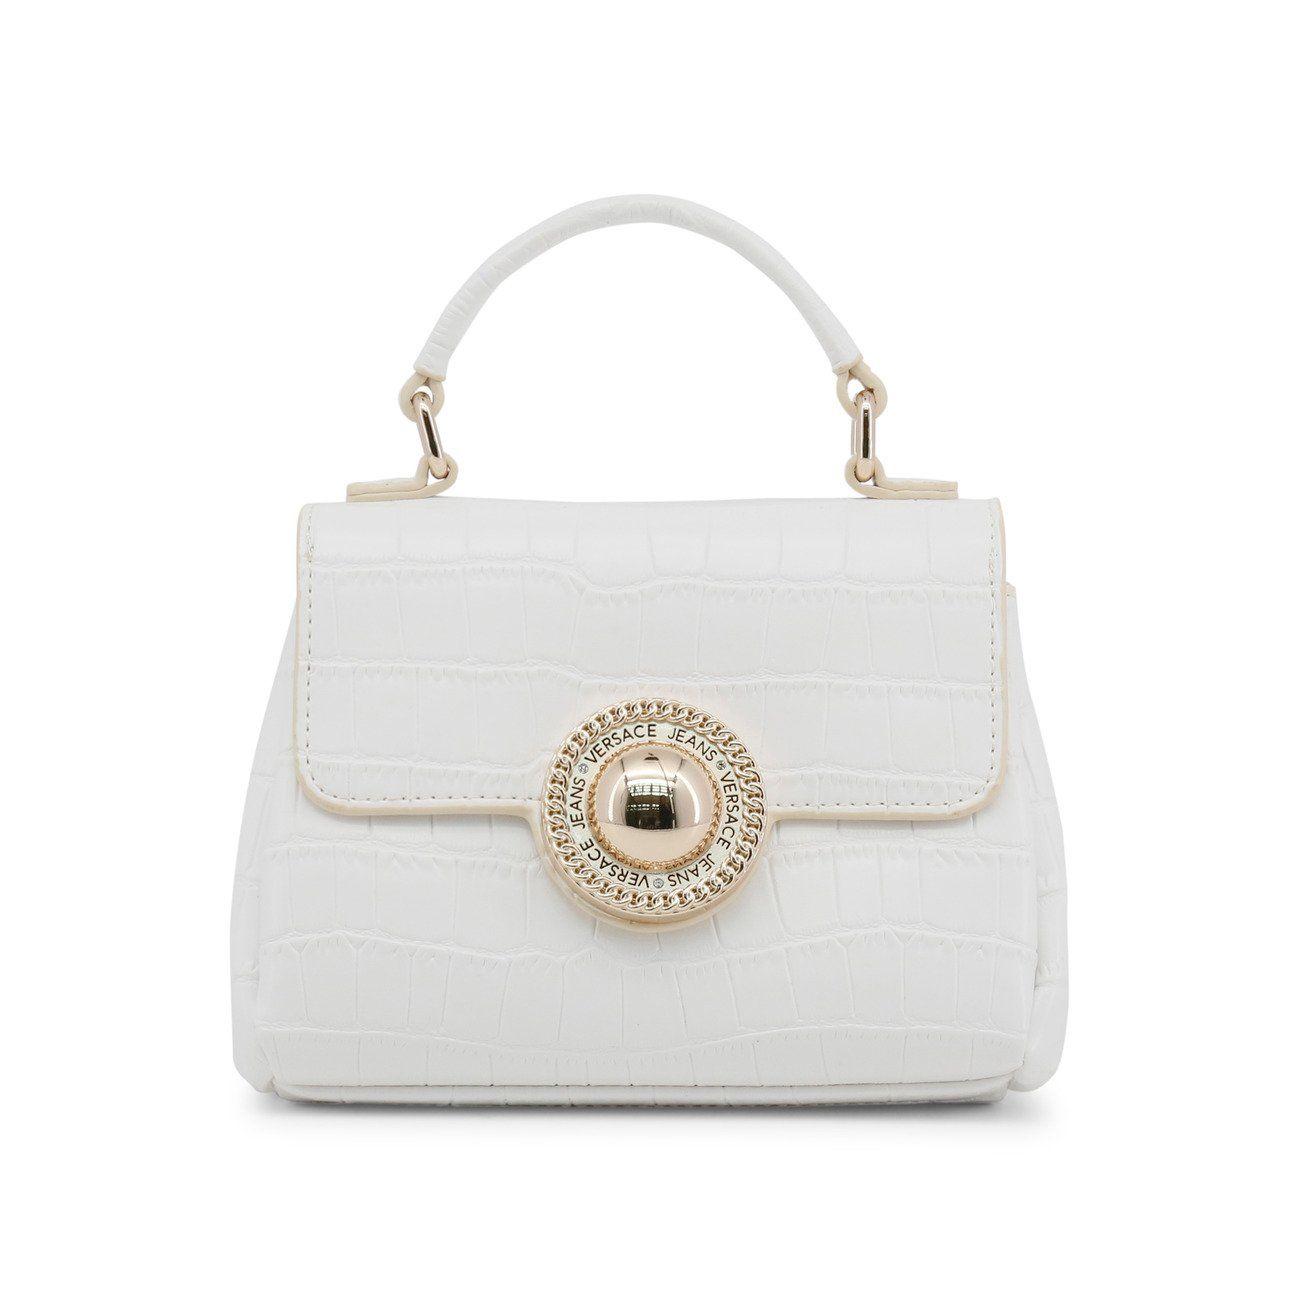 90b5c058b7 Leather Handbags · Versace Jeans · Shoulder Purse · Shoulder Strap ·  Fashion Week · https://www.buzzao.com/media/catalog/product/